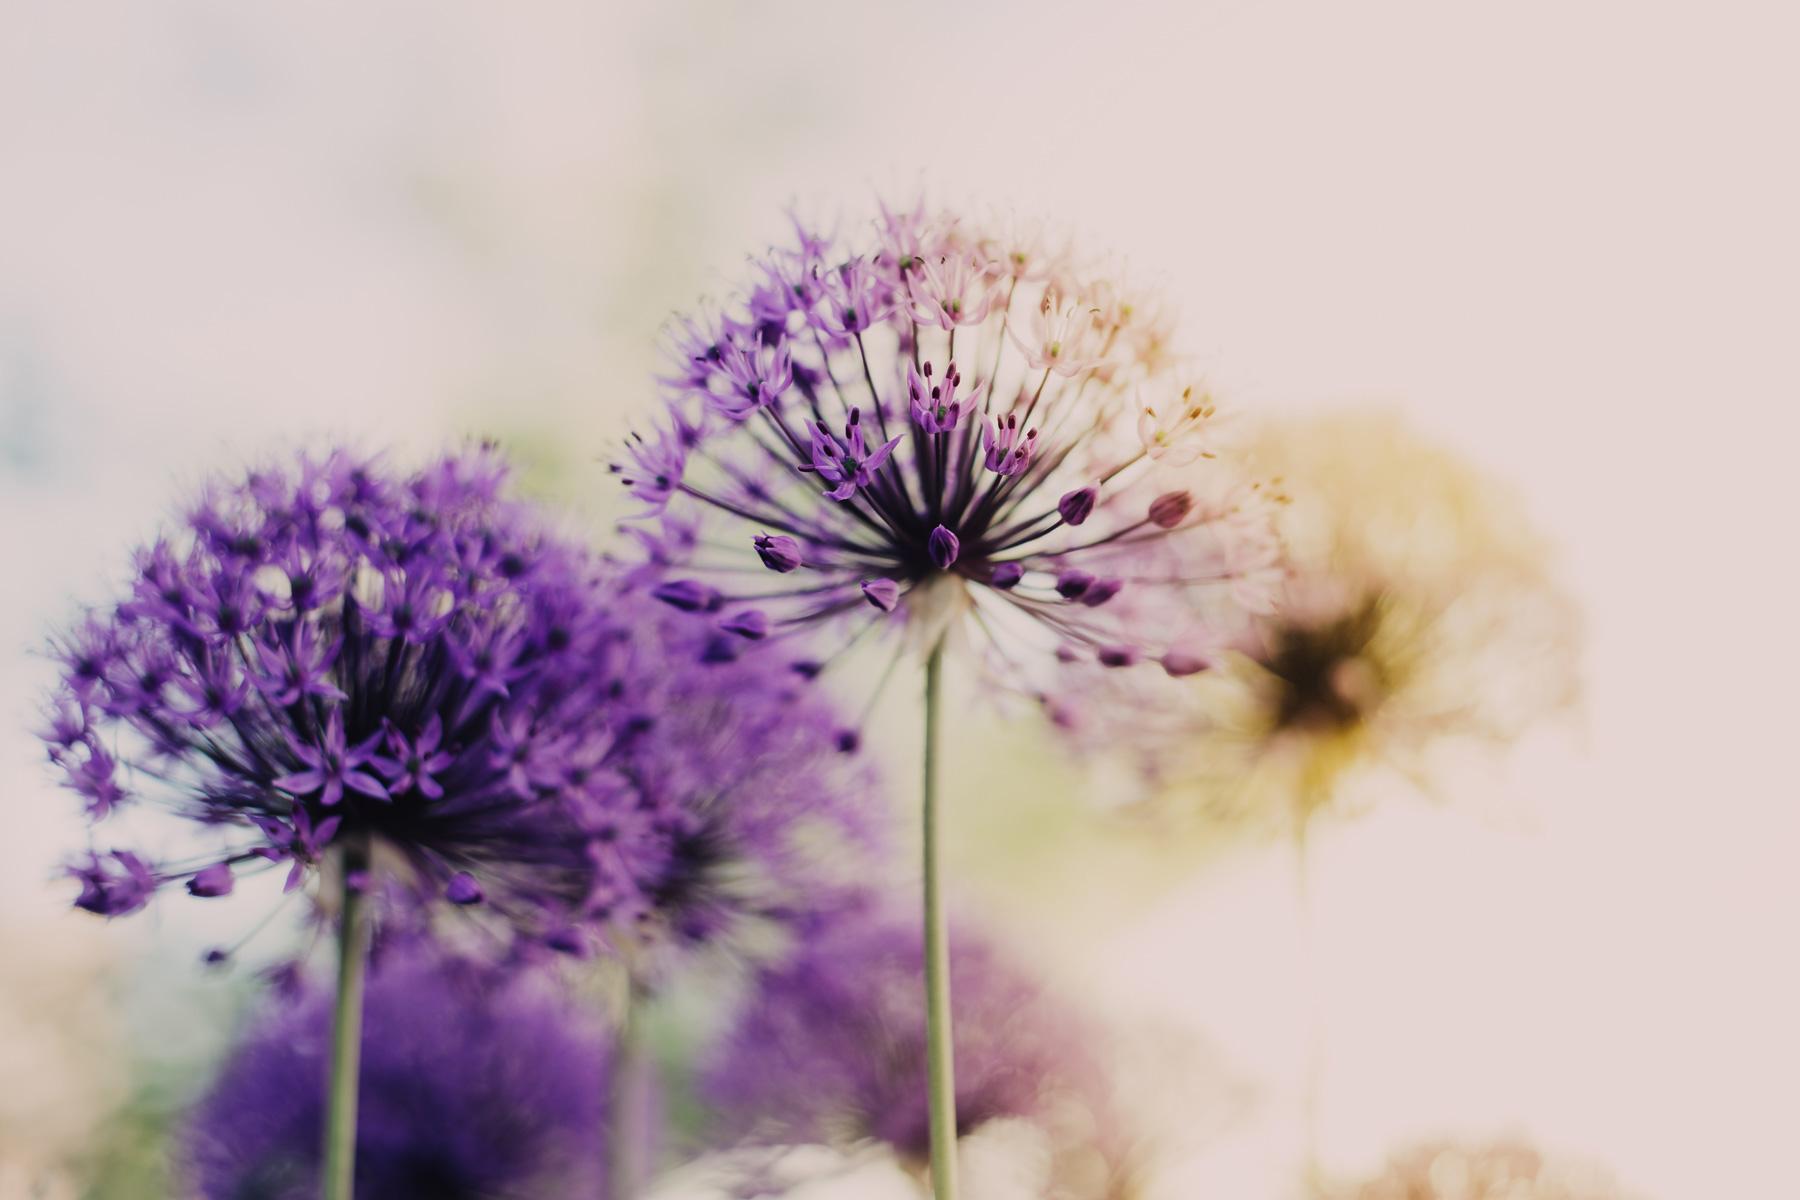 Hintergrundbild Alliumblumen